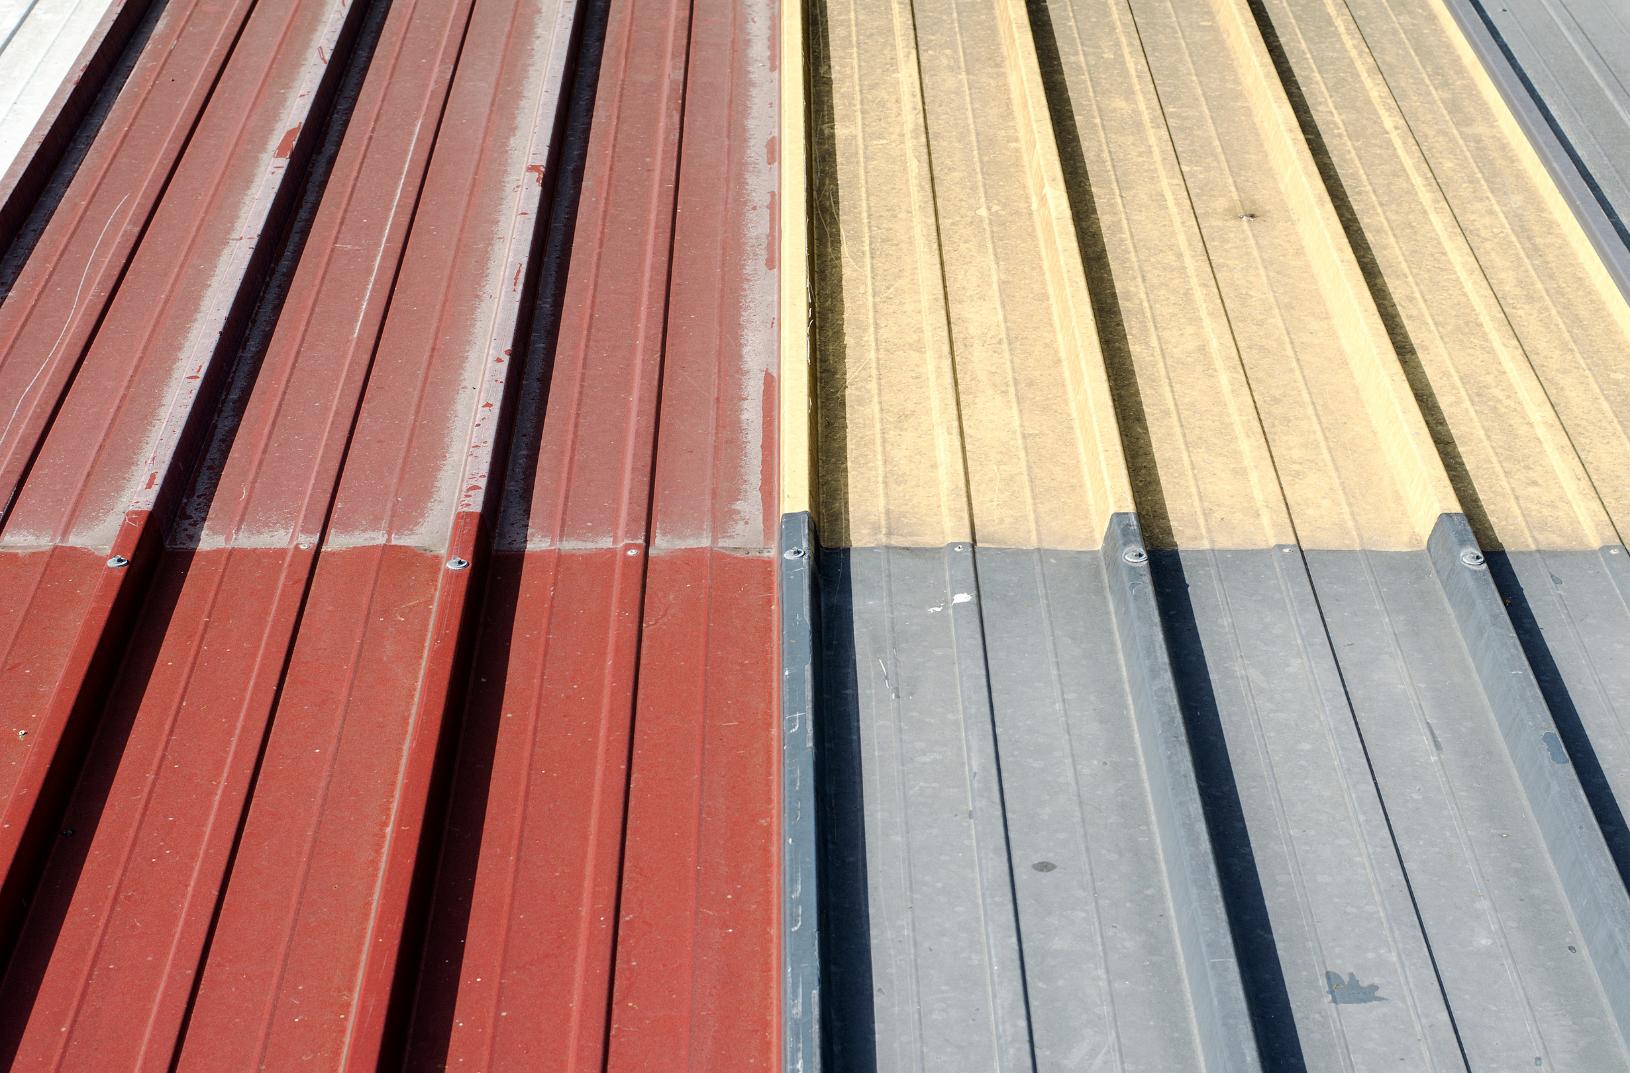 Portland roofing company